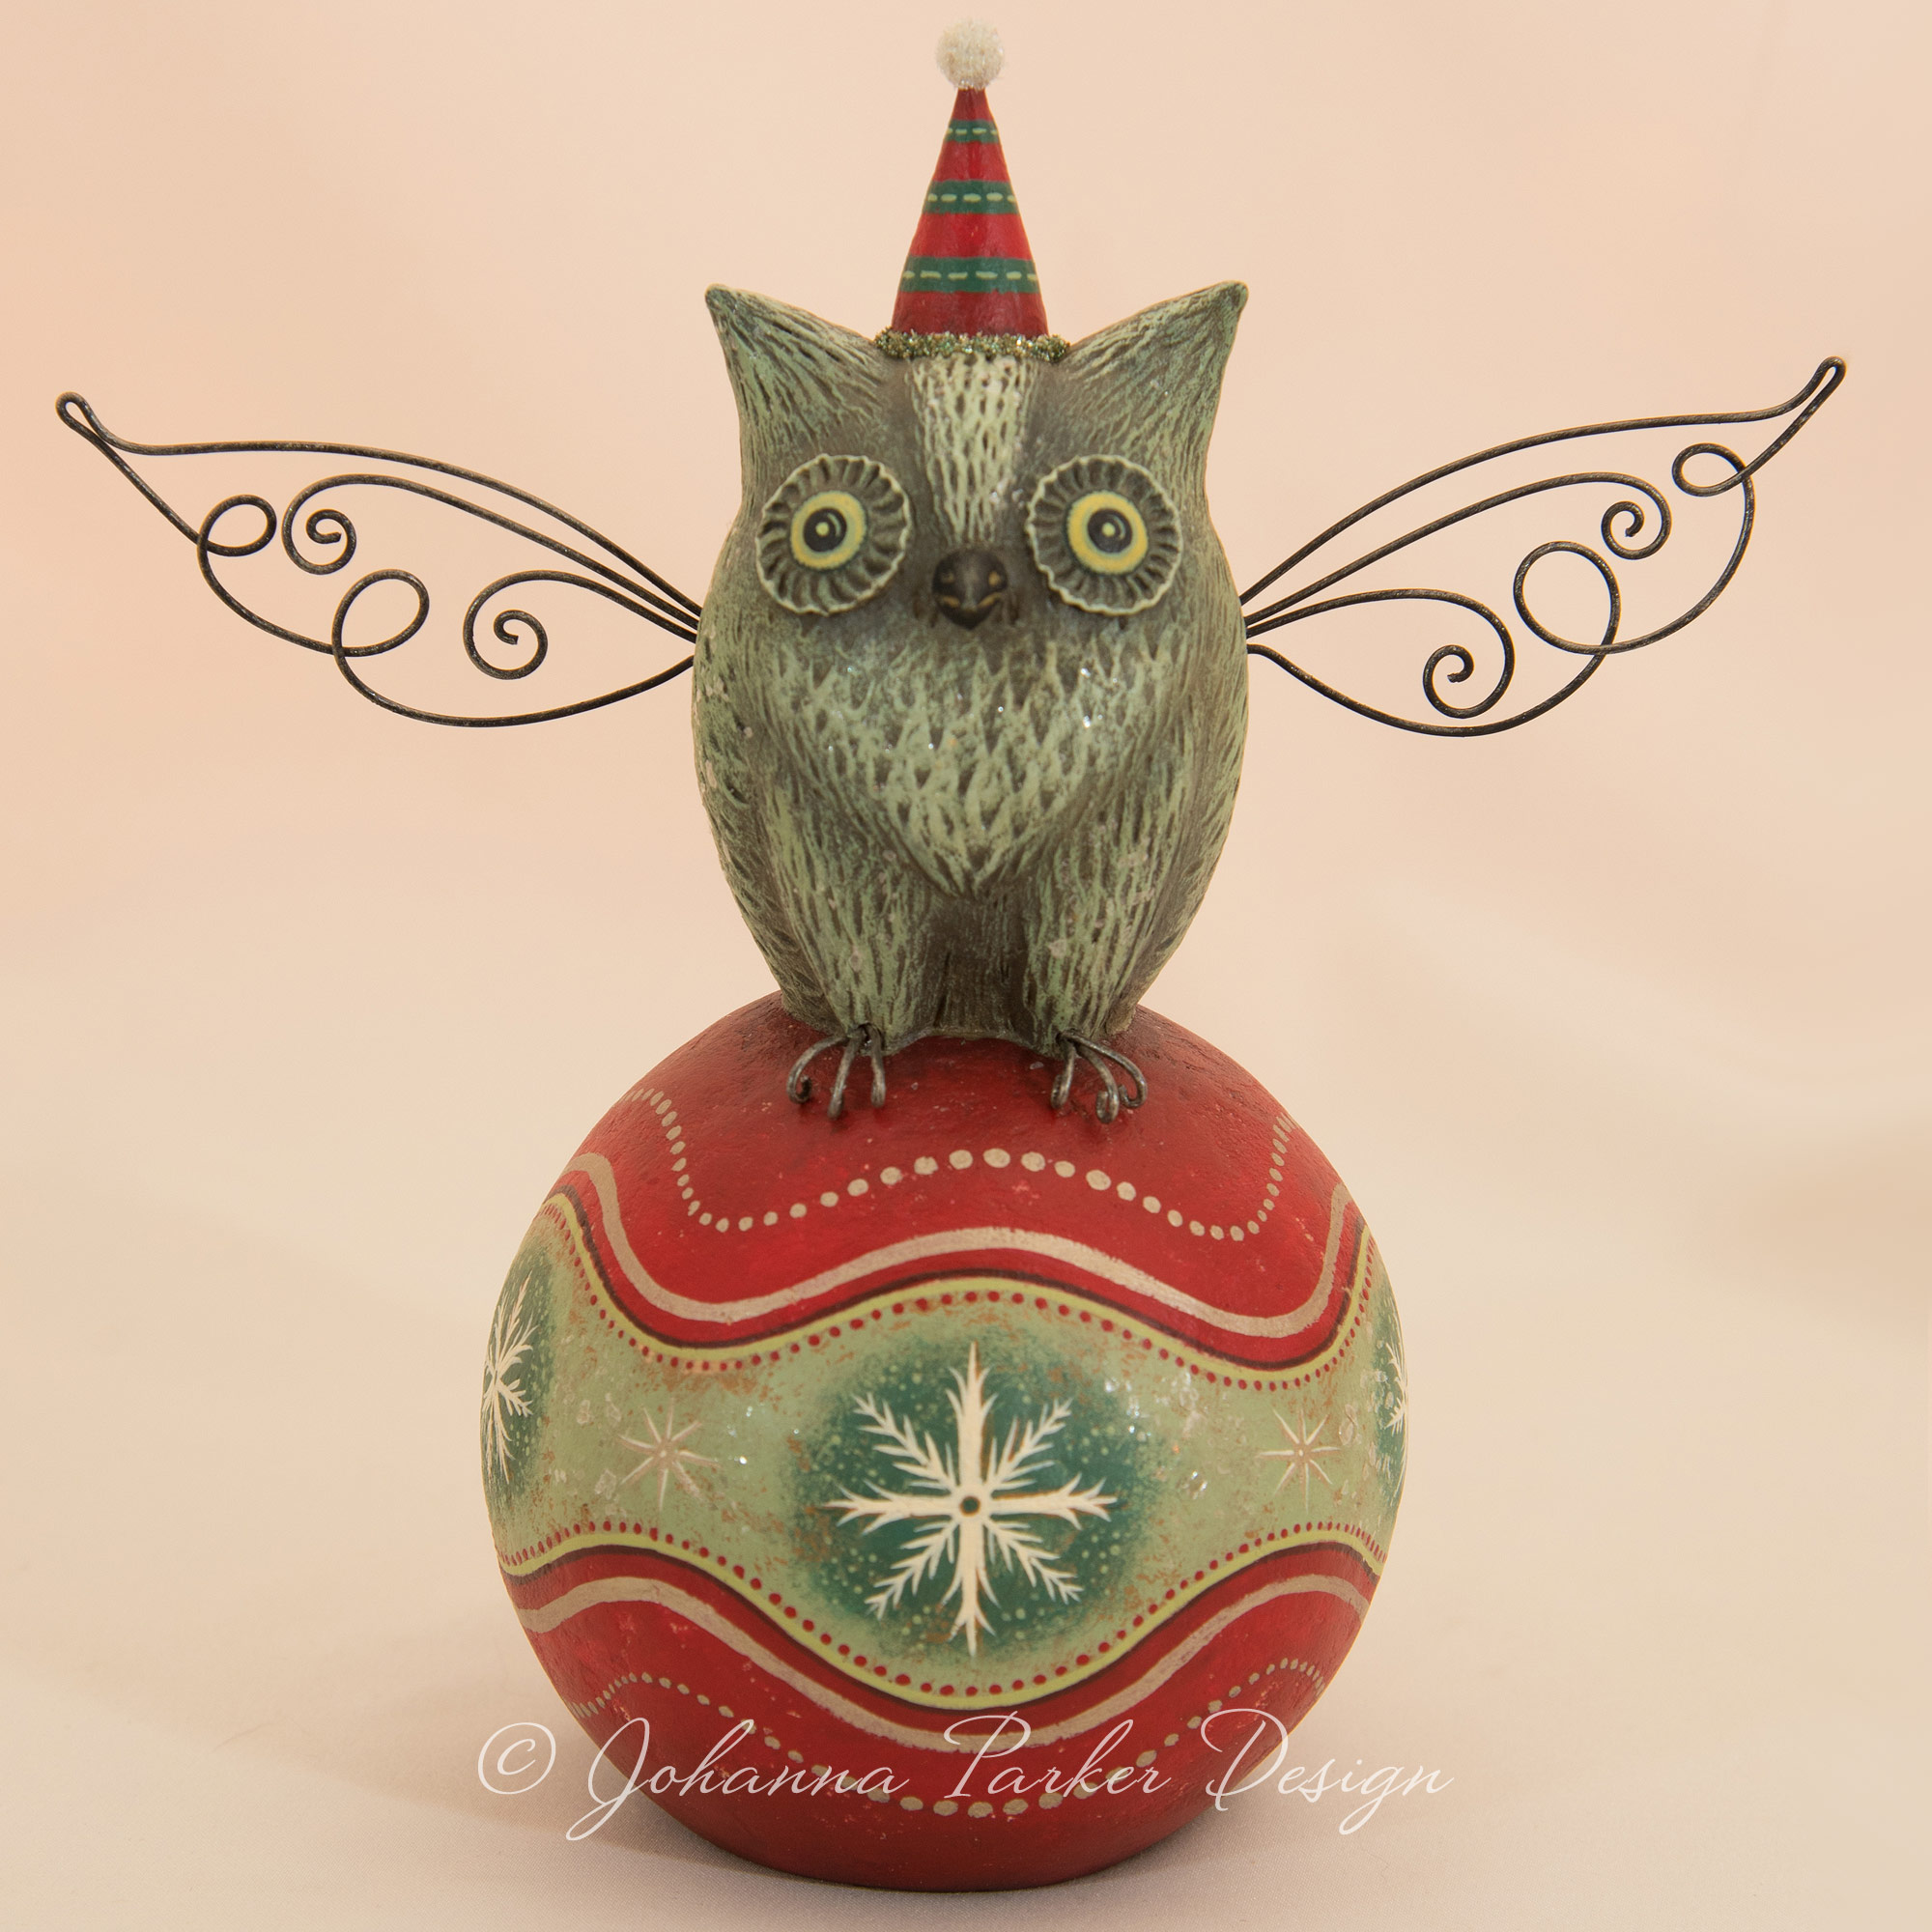 Johanna-Parker-Evergreen-Owliver-7.jpg